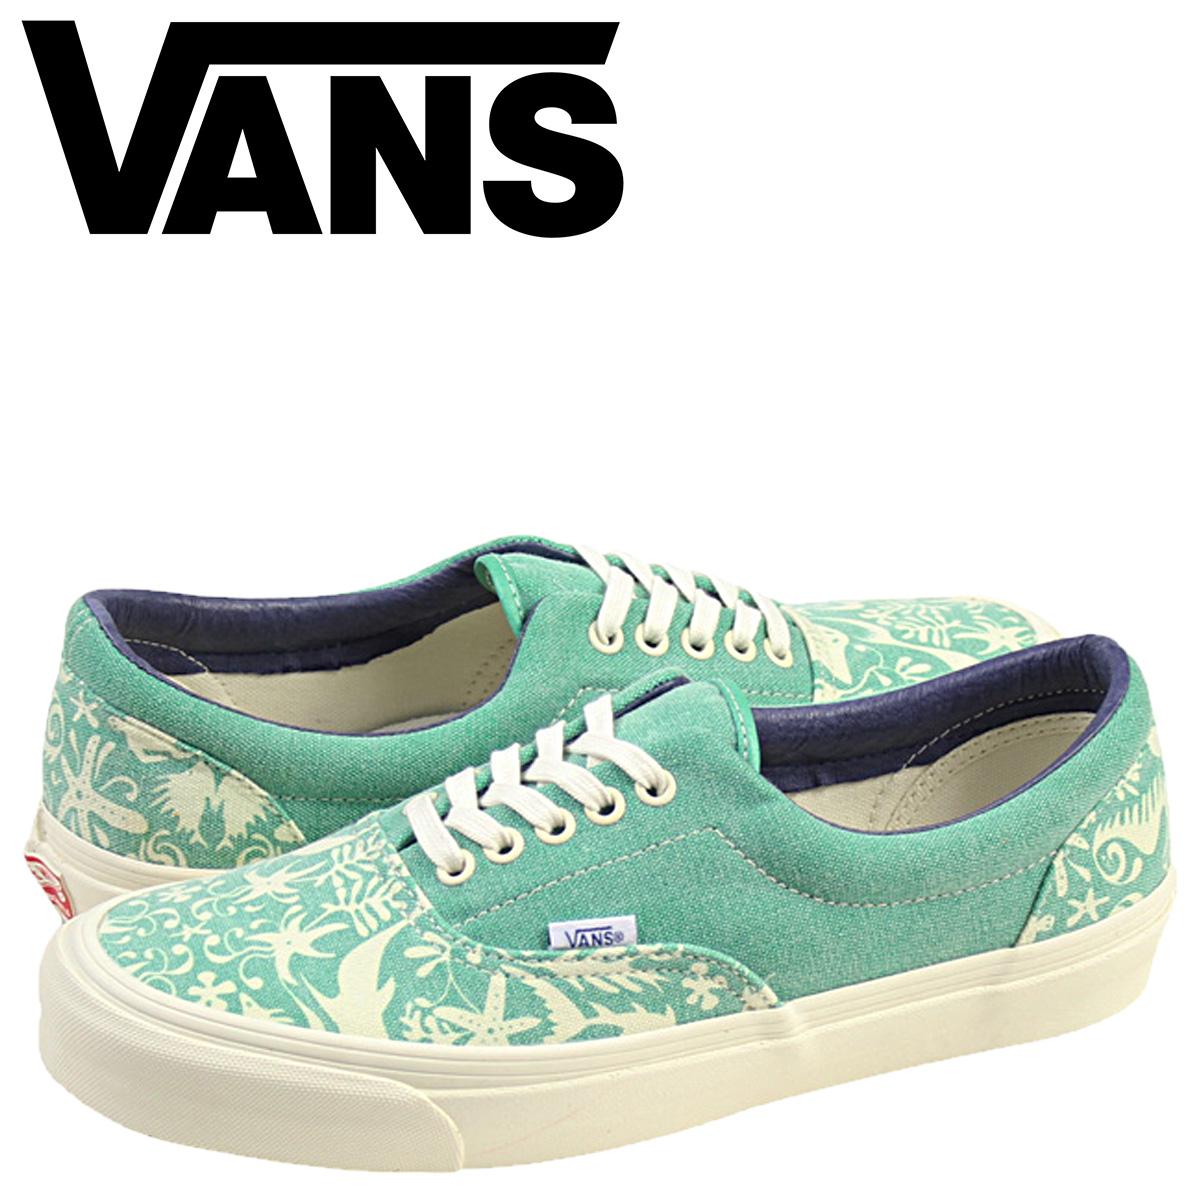 b9dfbdeb54 Sugar Online Shop  Vans VANS VAULT OG ERA LX TH SEA LIFE sneakers ...